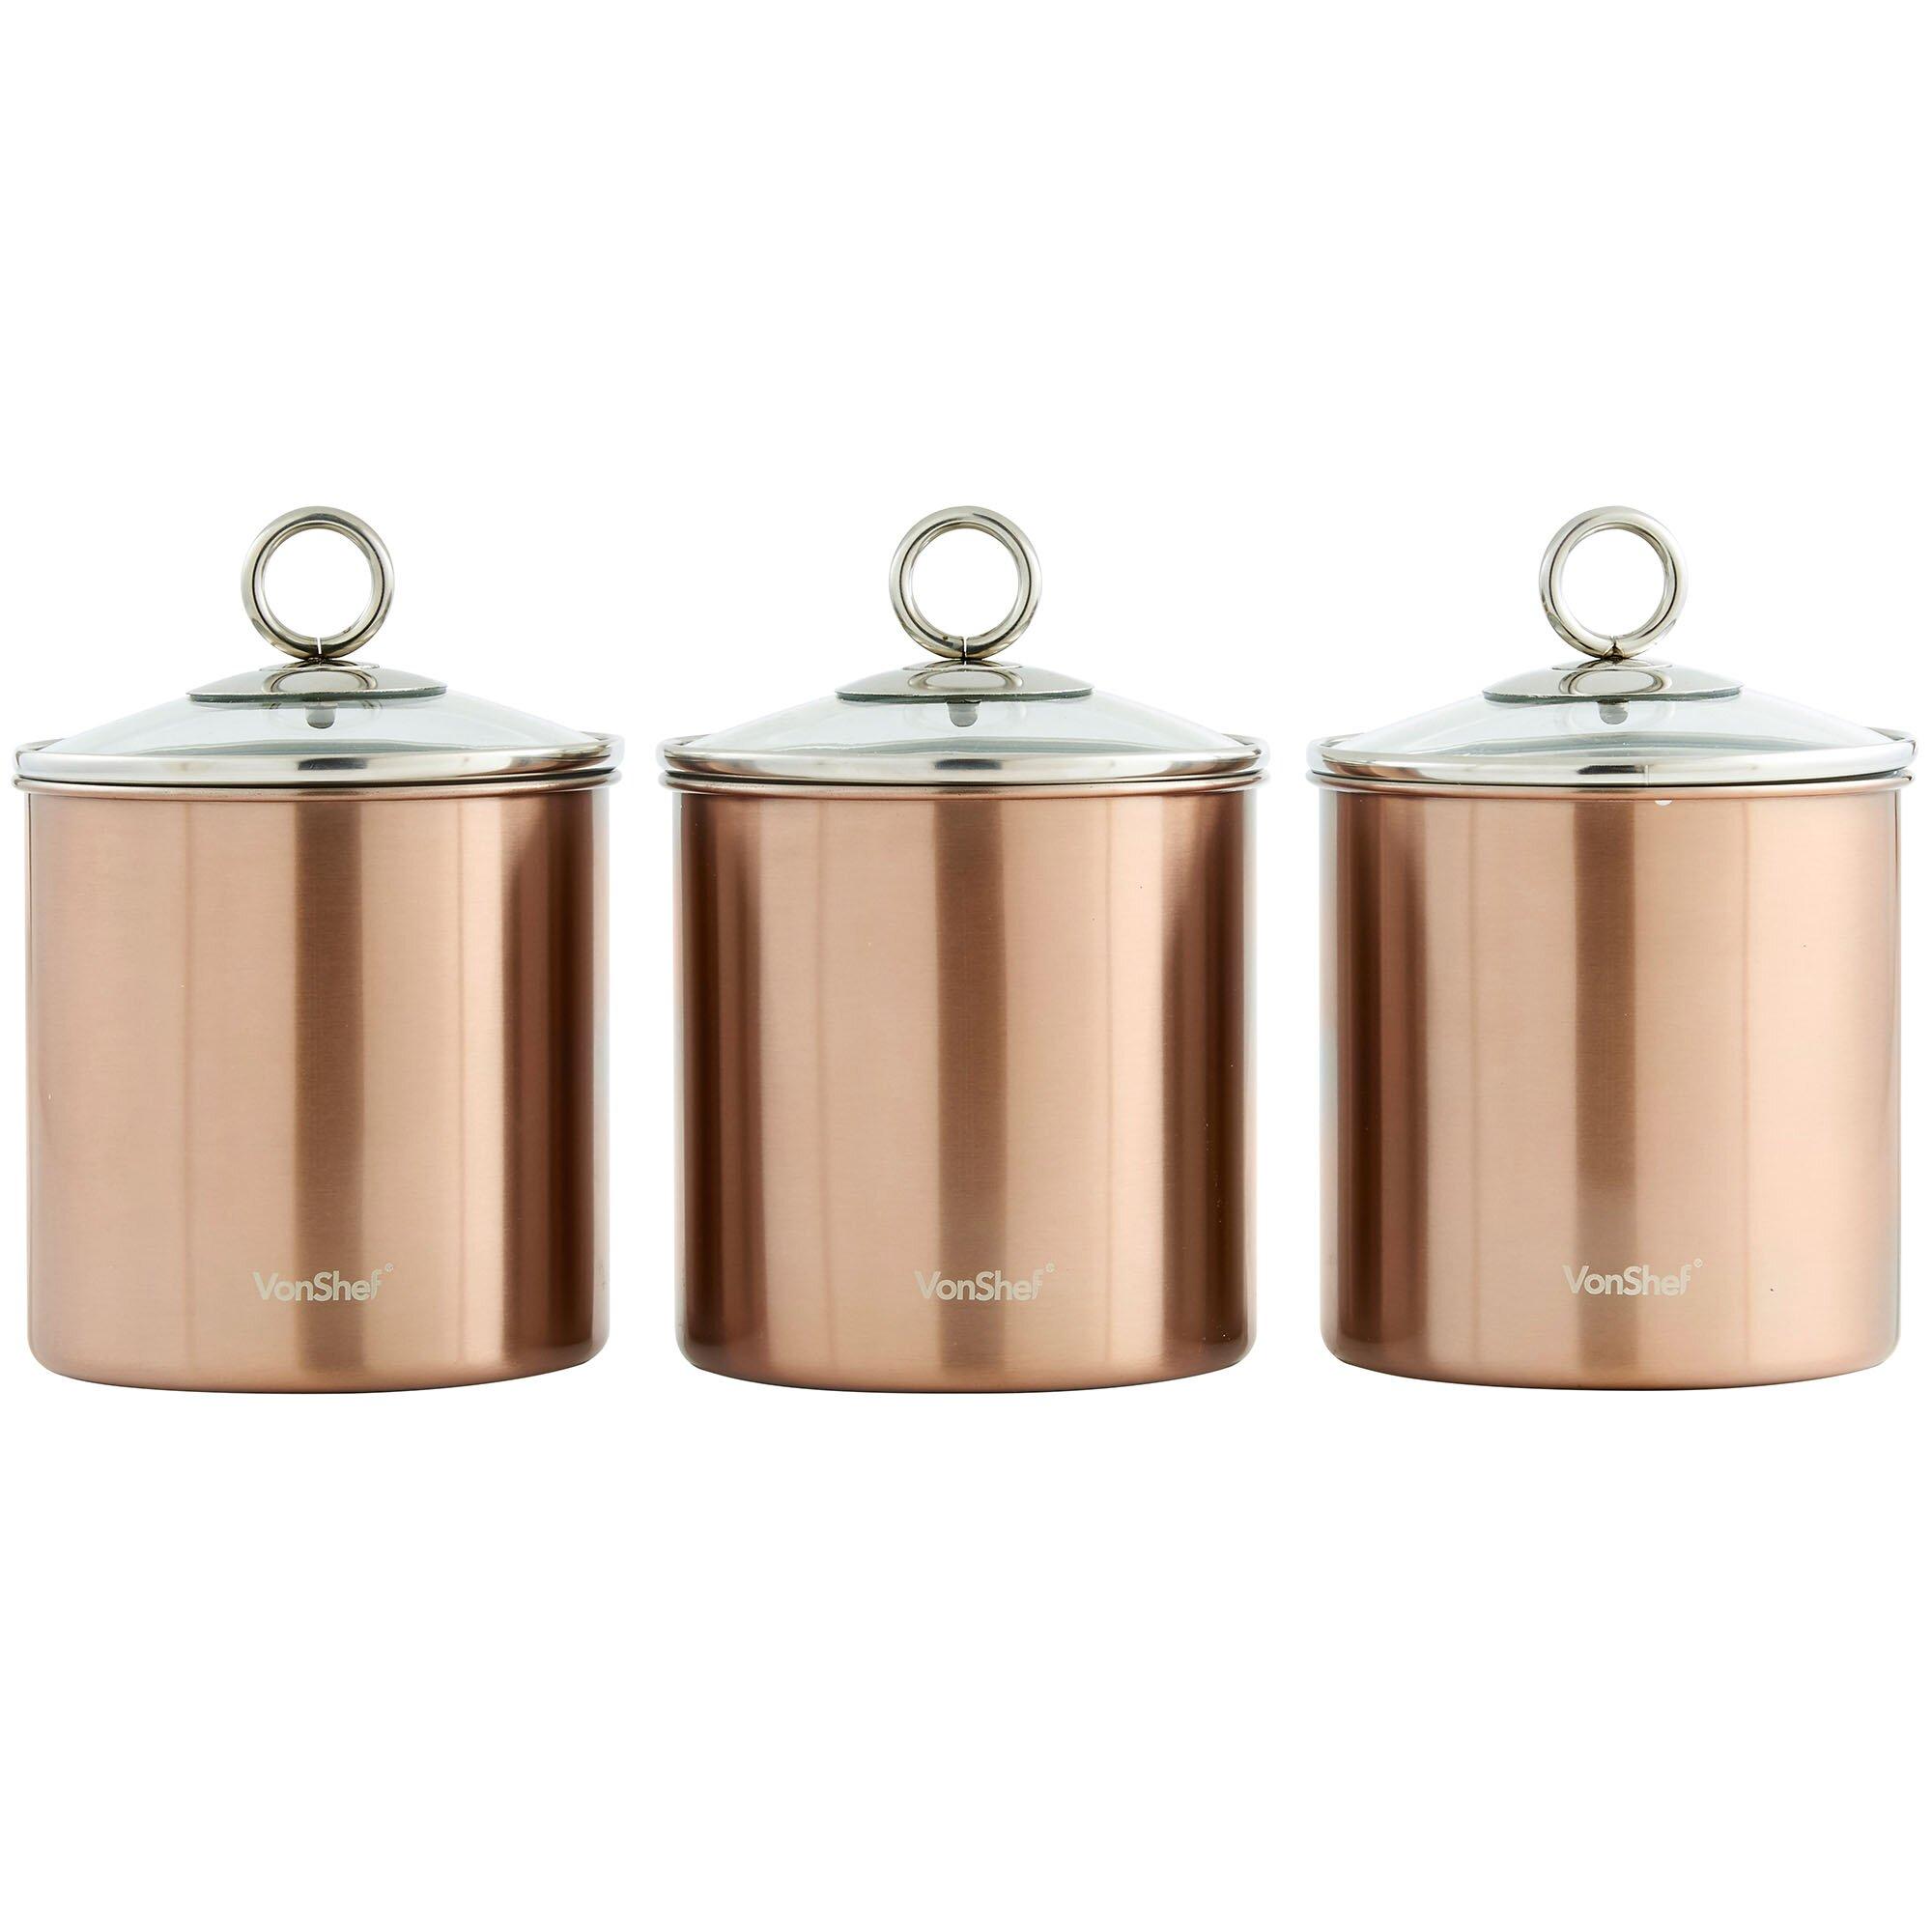 28 kitchen canister sango 4 piece avanti canister set kitchen canister vonshef 3 piece kitchen canister set wayfair ca